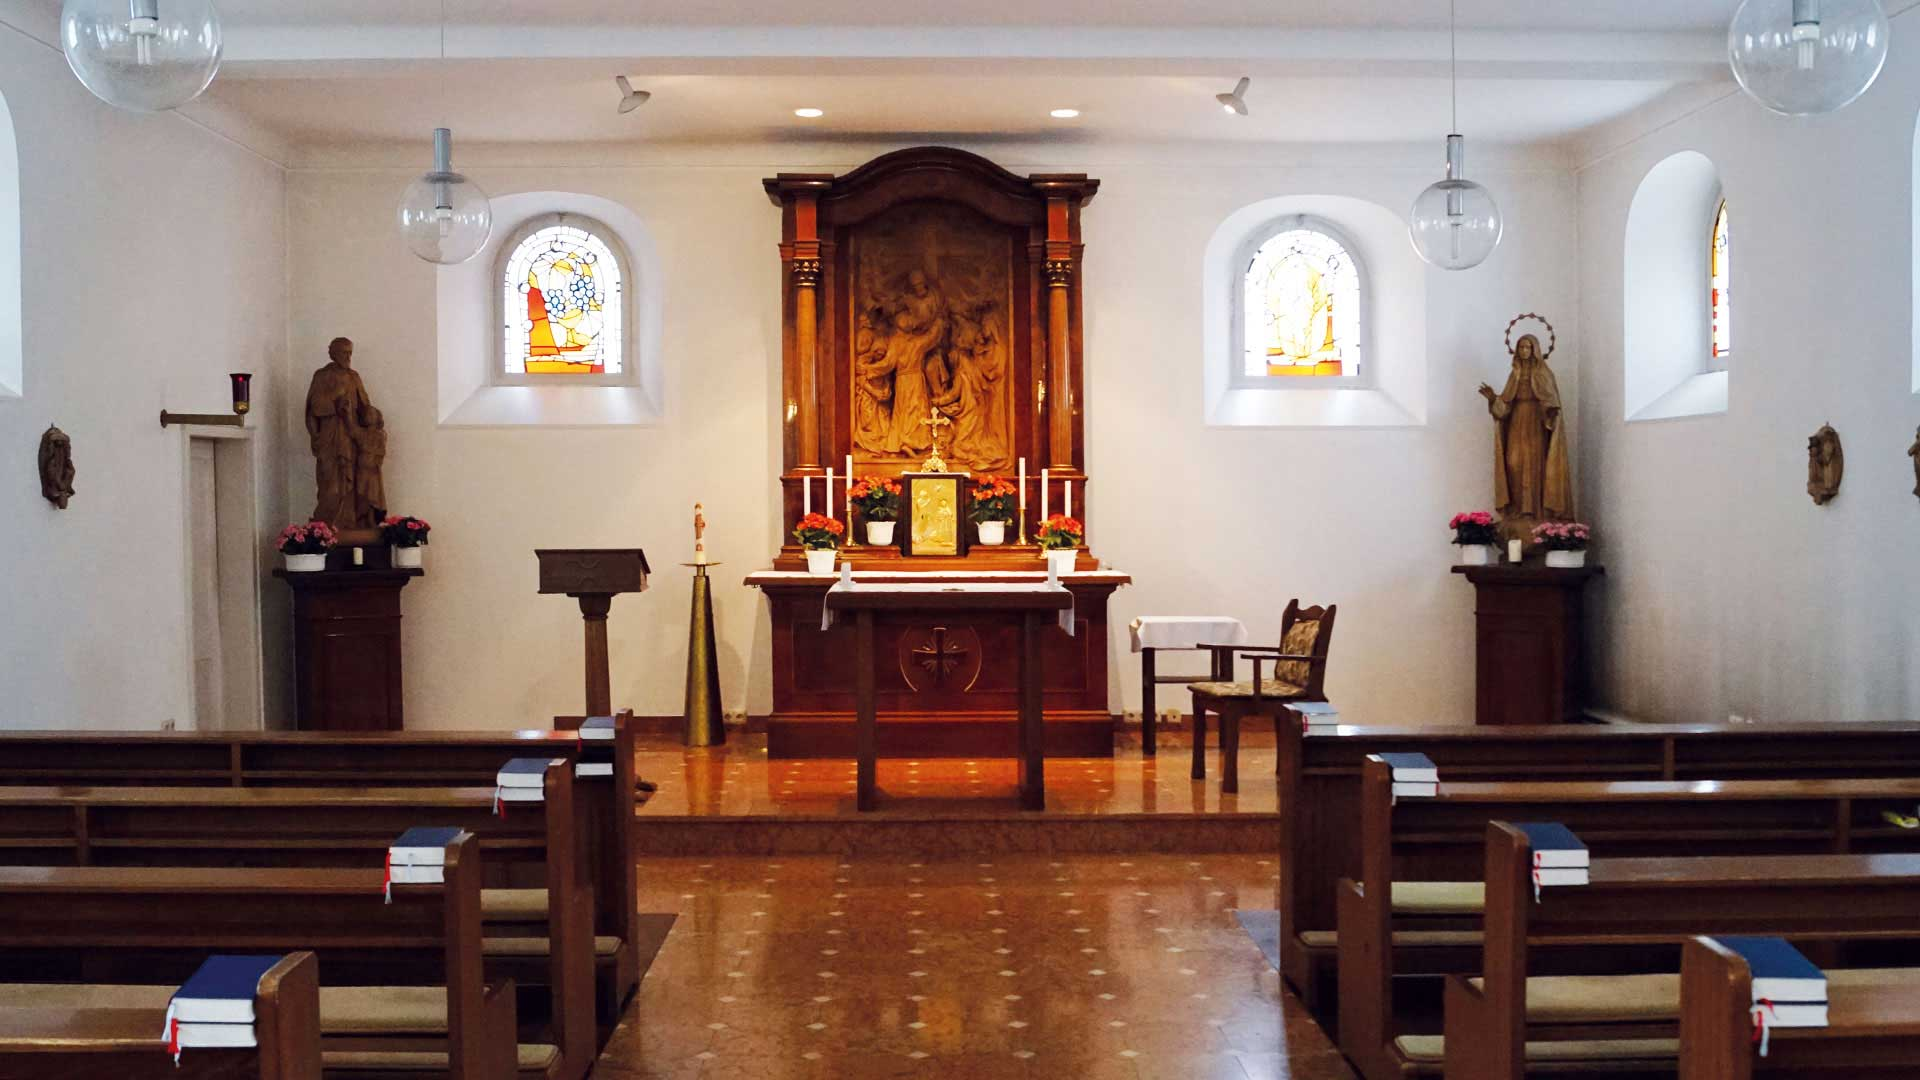 Seniorenzentrum-Bruder-Konrad-Stift-Hauskapelle-St-Anselmus-3